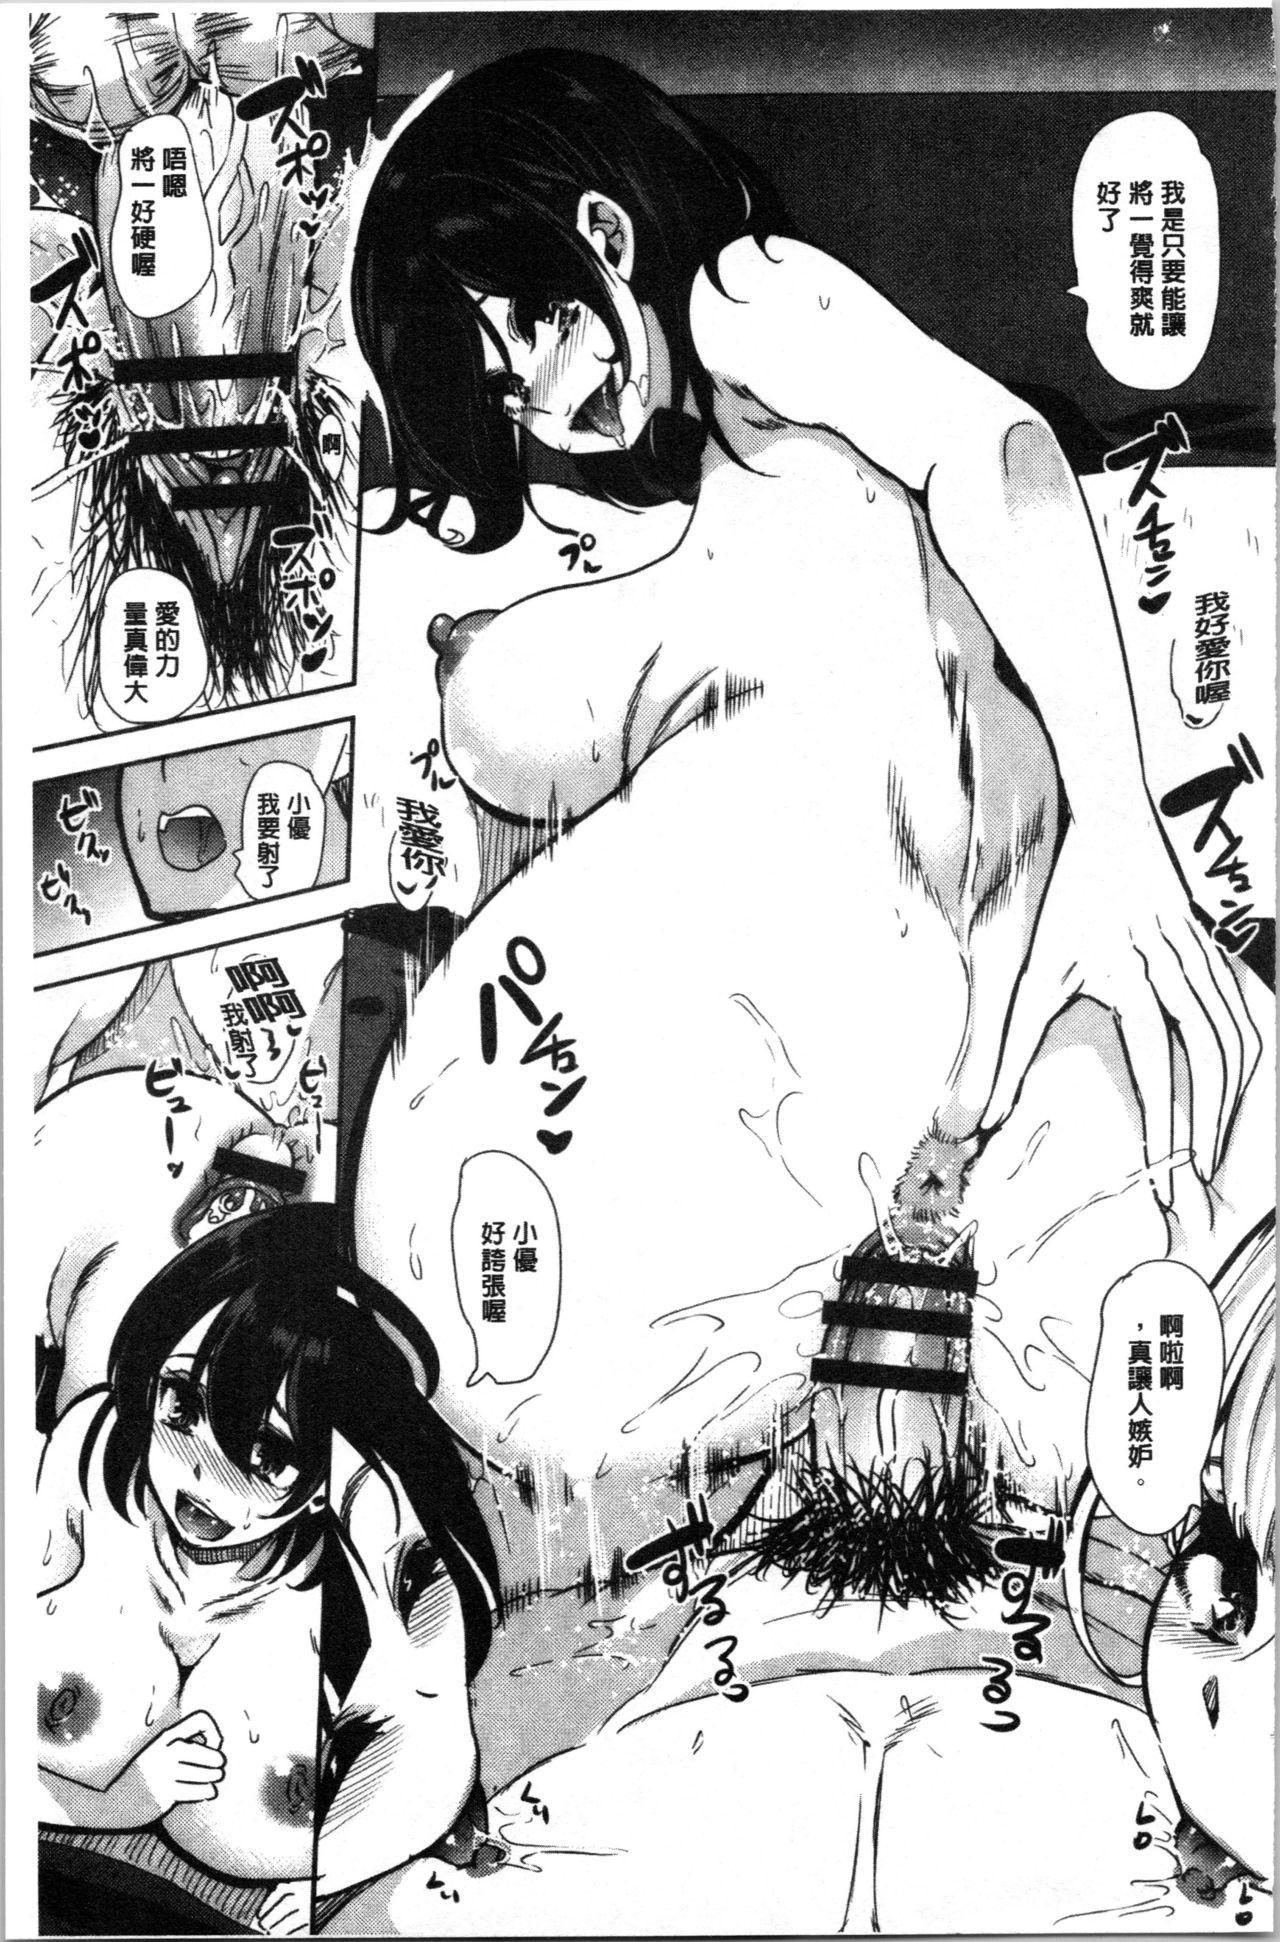 [Ootori Mahiro] Boku no Super Harem Sentou ~Otome no Naka ni Otoko wa Boku dake~ - My super harlem public bath, I am the only man in the public bath full of pussy cats. | 我的後宮選妃般的超級錢湯~乙女之間只有我一個男人~ [Chinese] 96